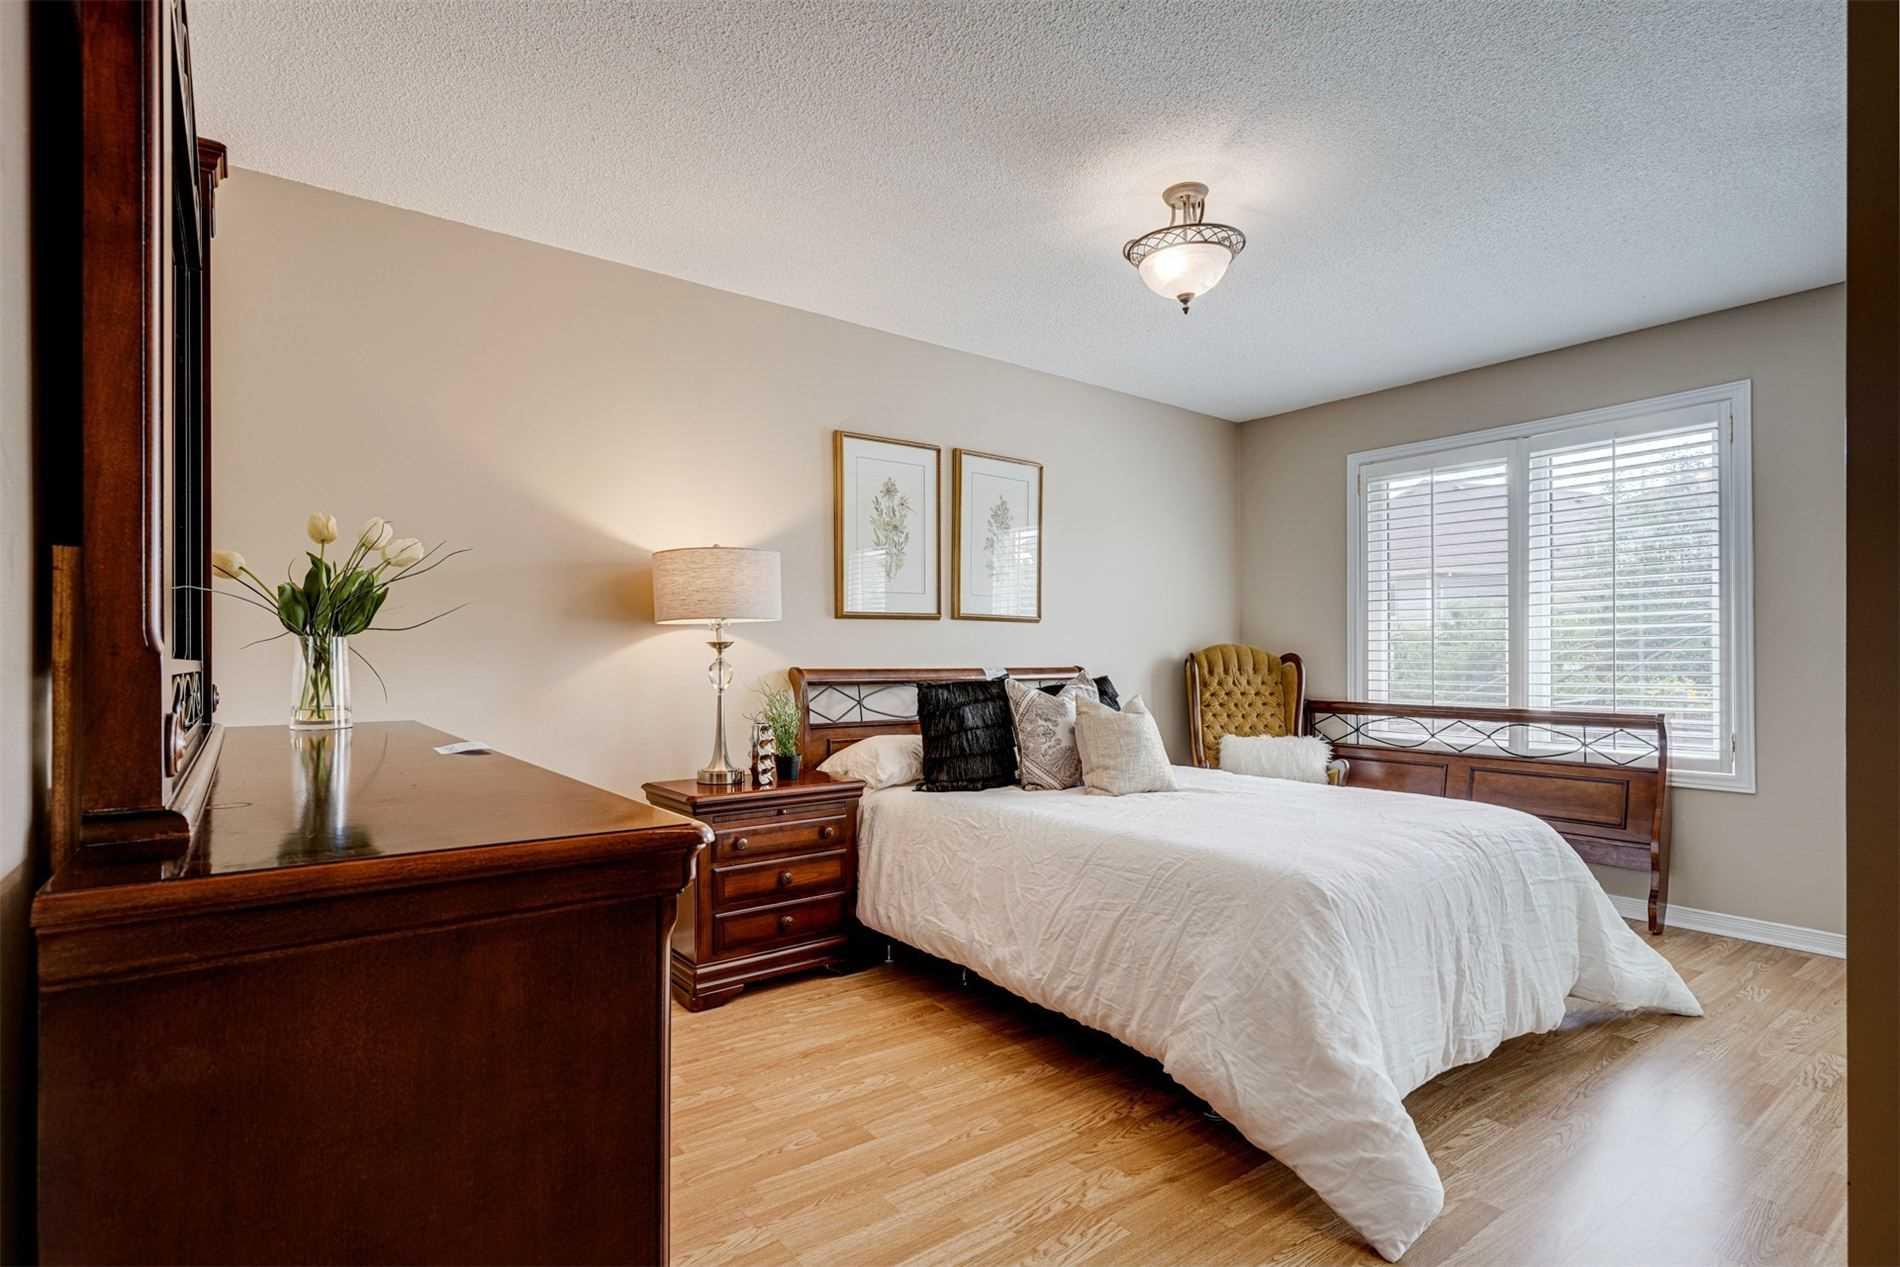 124 Monk Cres, Ajax, Ontario L1Z1H2, 2 Bedrooms Bedrooms, 7 Rooms Rooms,2 BathroomsBathrooms,Detached,For Sale,Monk,E5352008